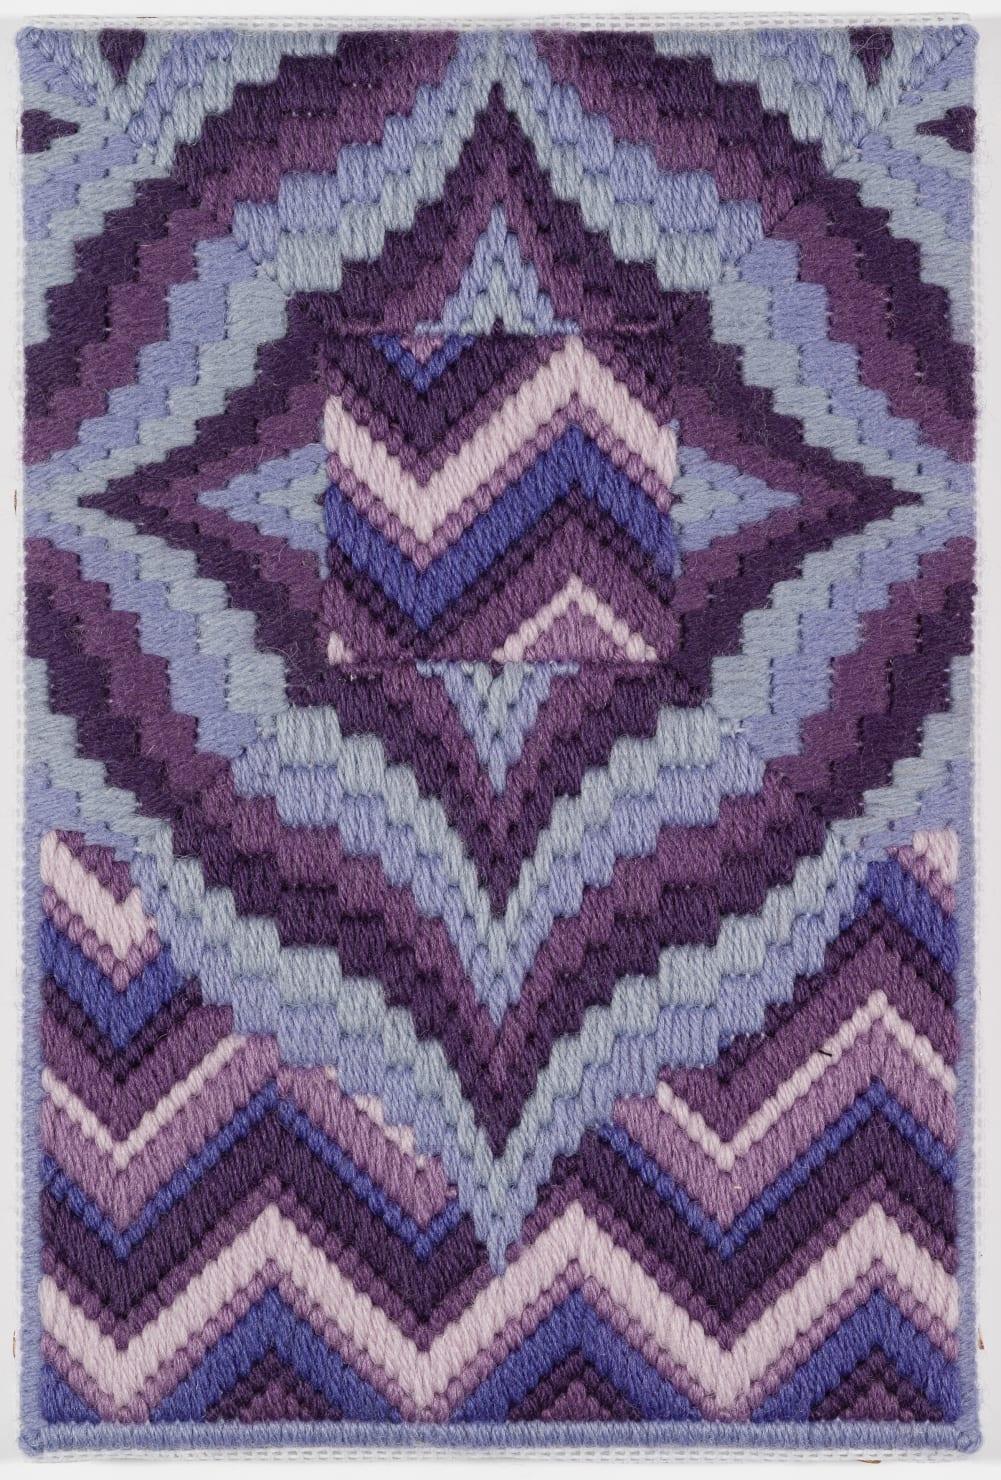 Cecilia Charlton, Rainbows on Titan (in memoriam to my childhood drawings) [purple], 2018